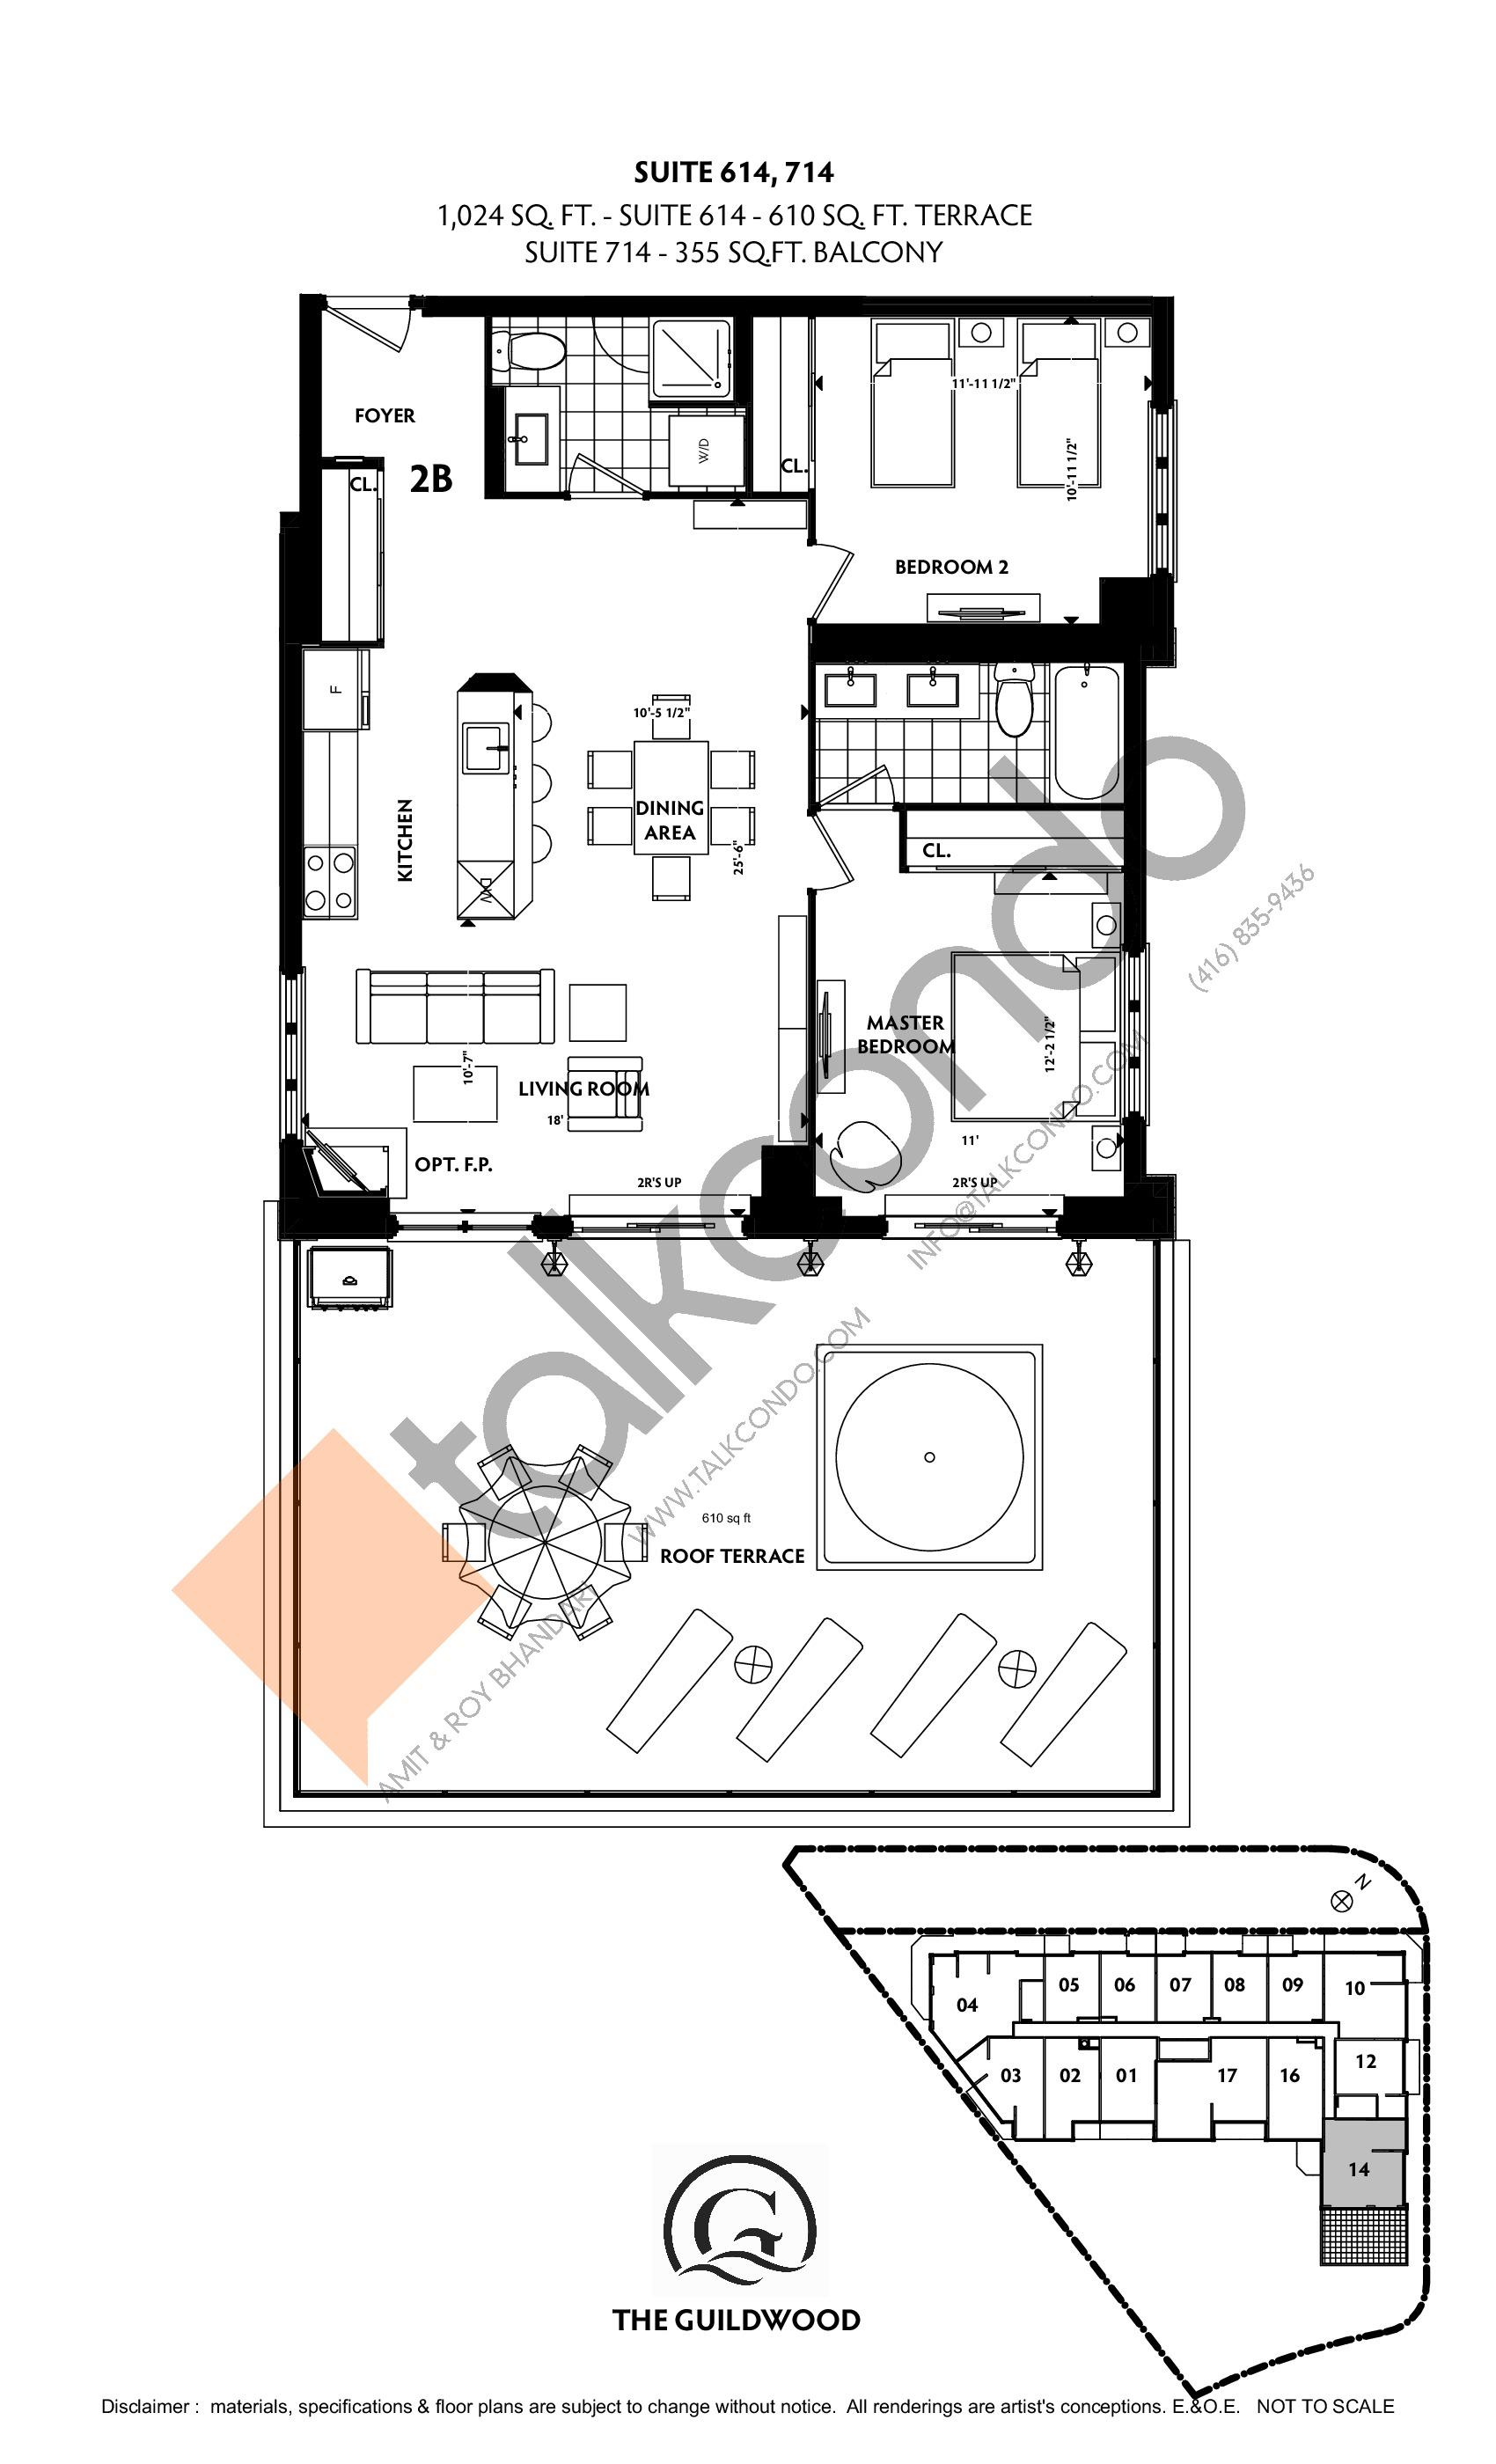 Suite 614, 714 Floor Plan at Guildwood Condos - 1024 sq.ft